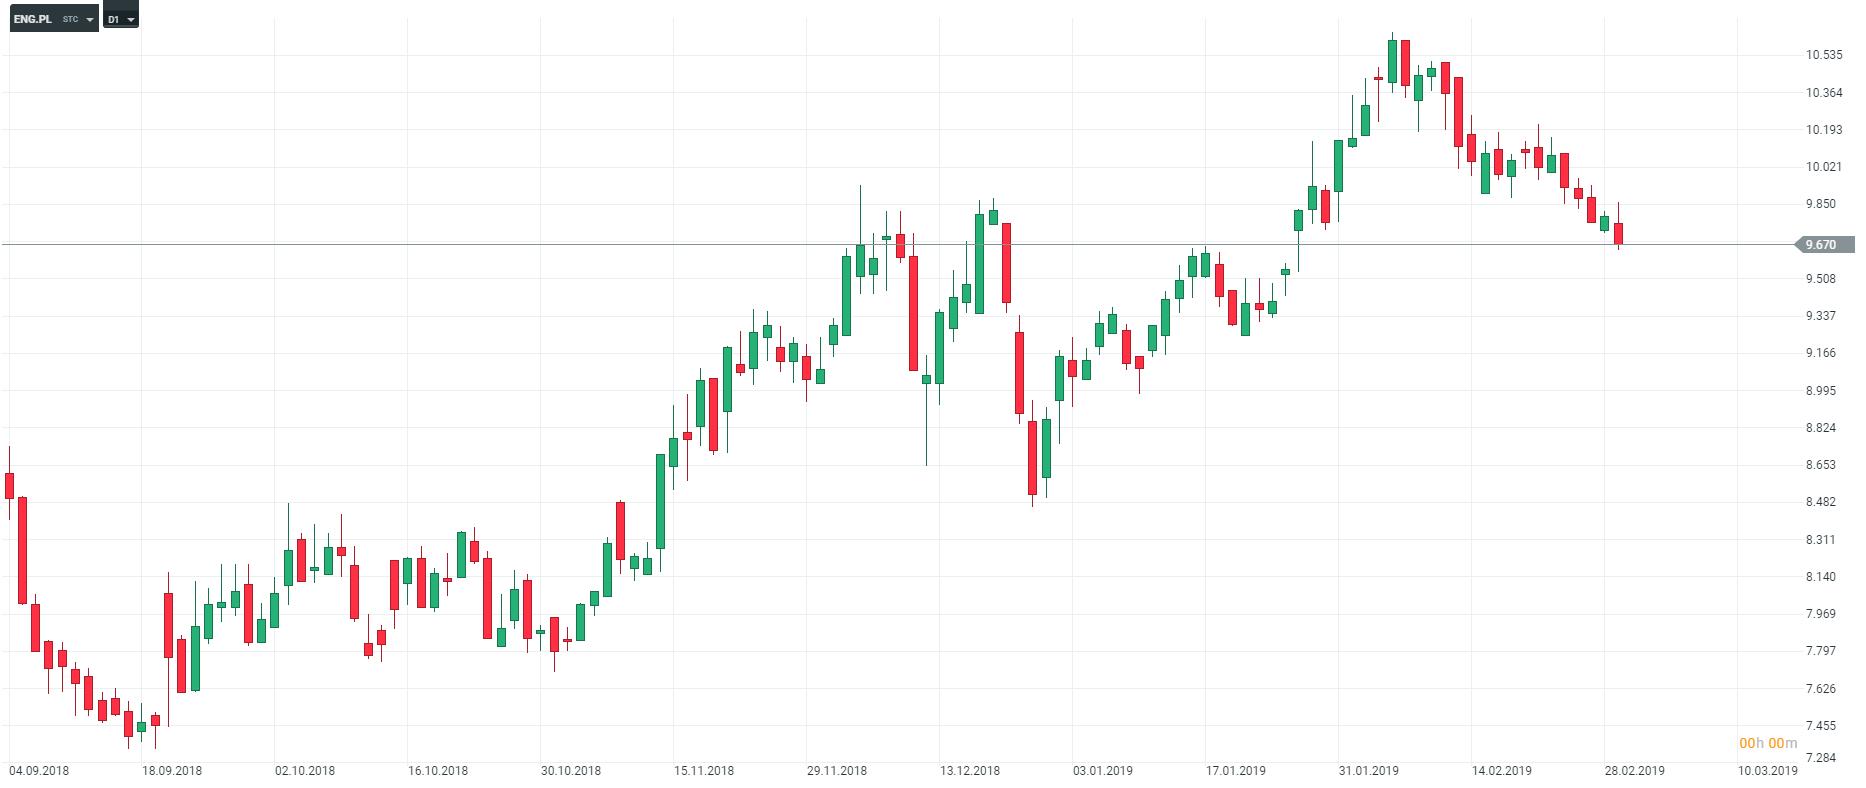 wykres eng Energa D1 04.03.2019